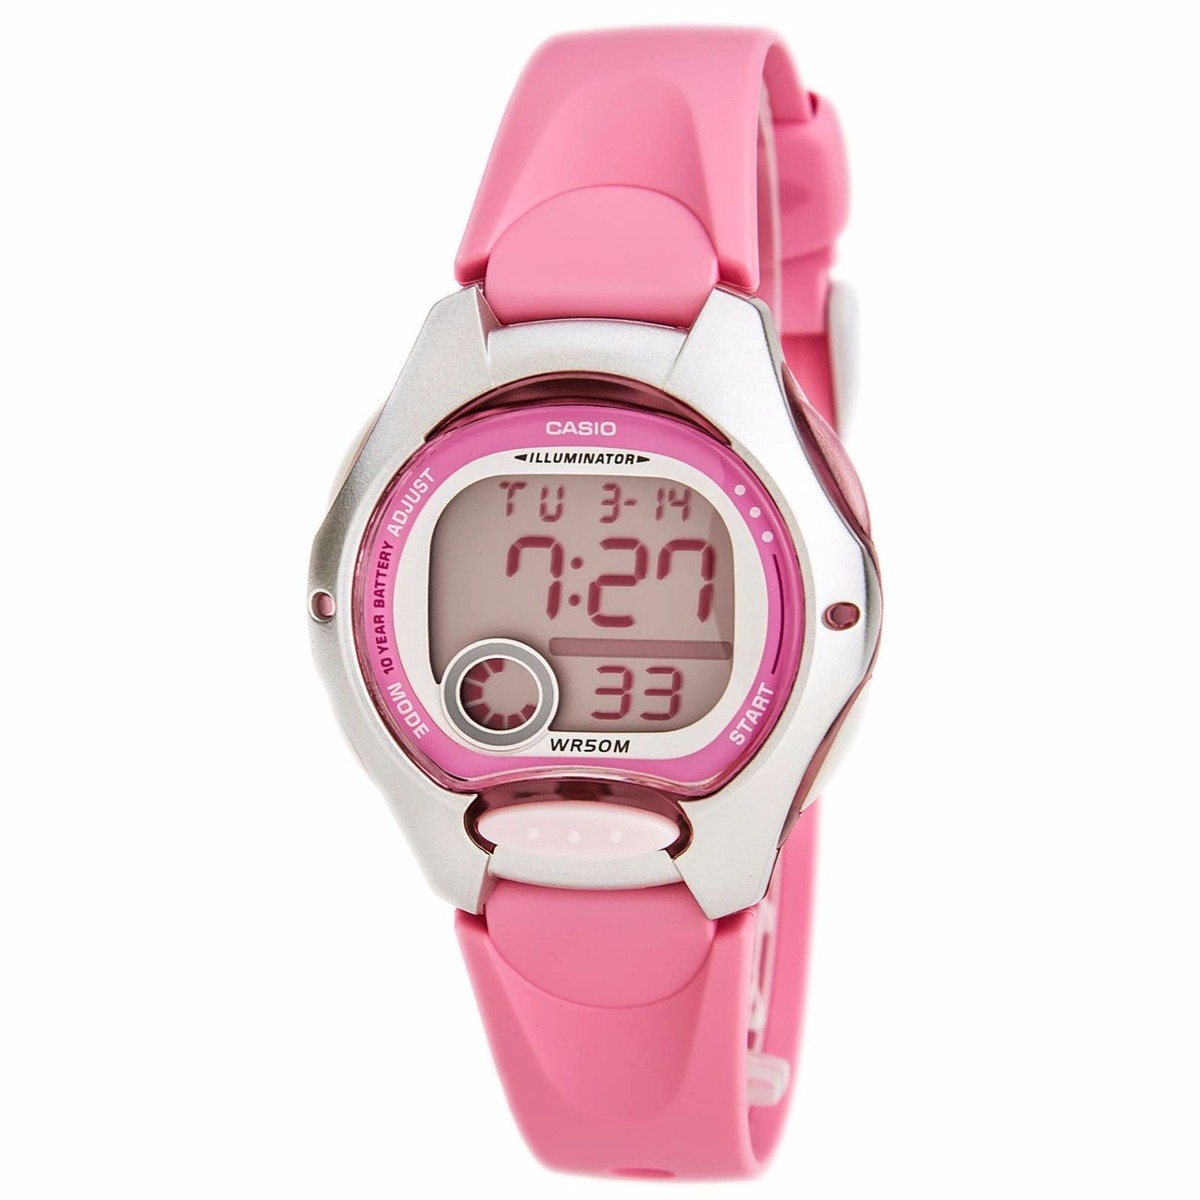 493bfa711d7 Relógio Casio Feminino Lw-200 Cronômetro Alarme Borr ro Rosa - R  169